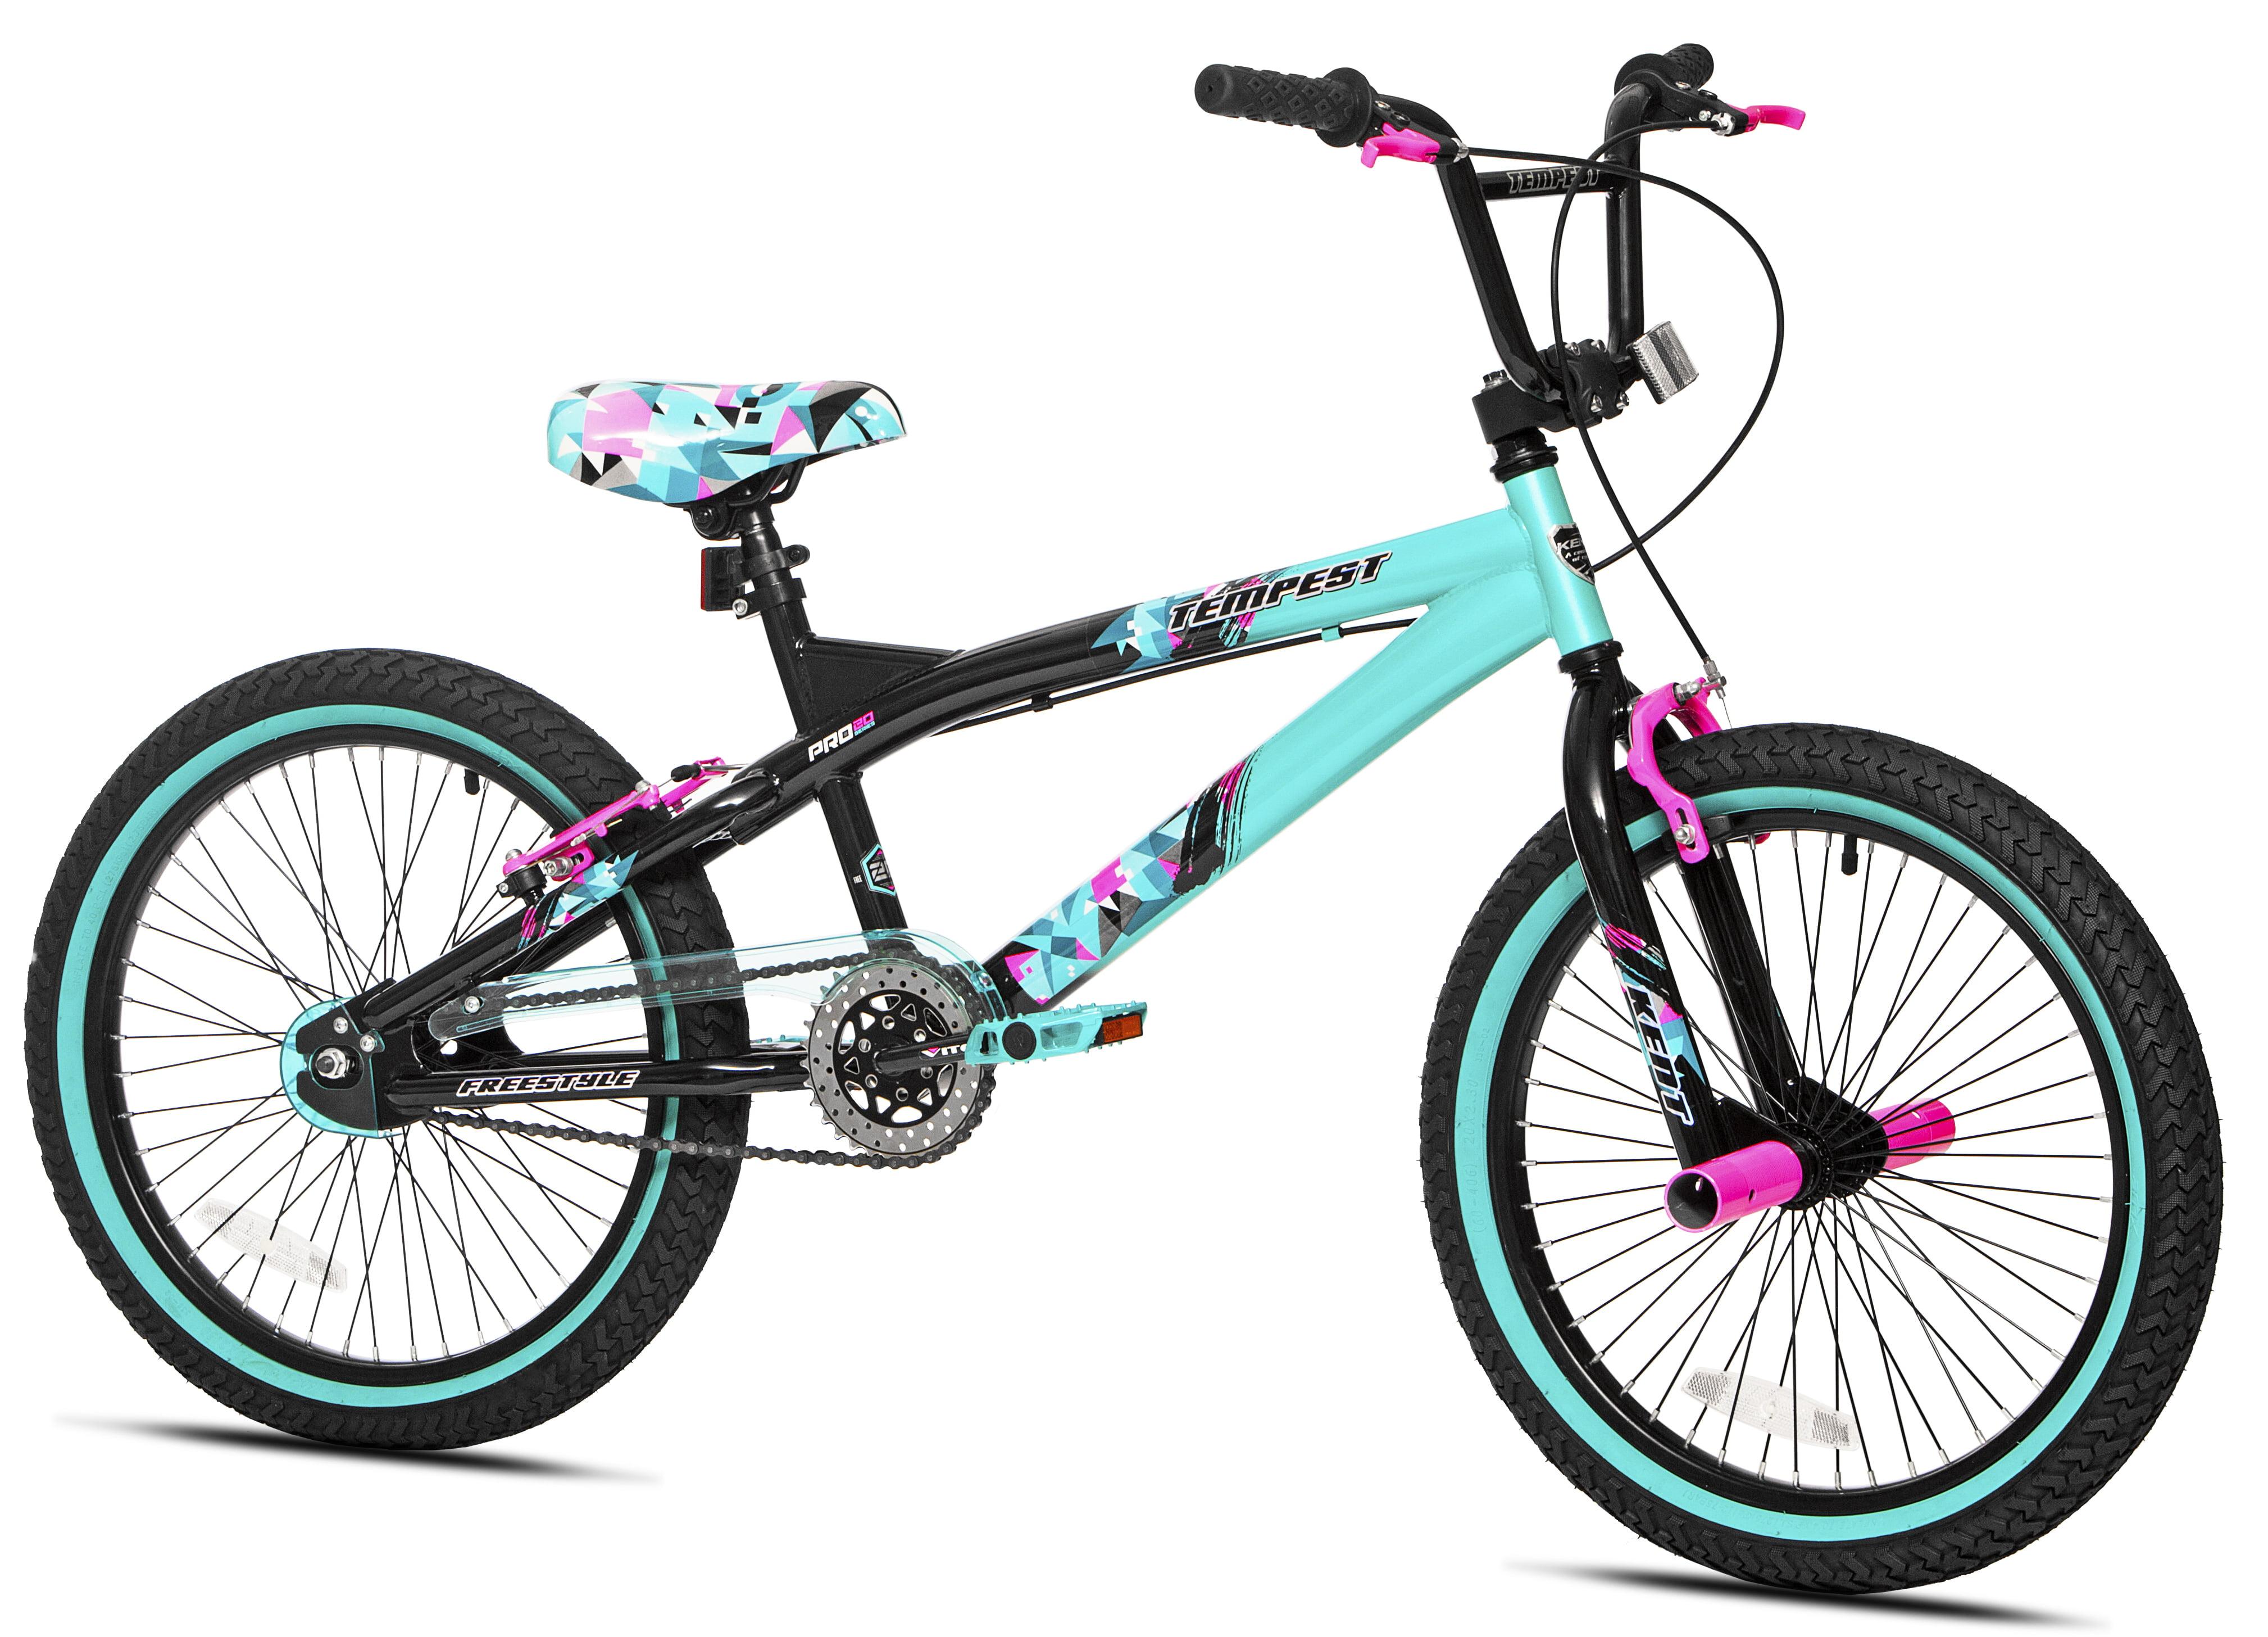 20 Kent Trouble Girl Bike Aqua Pink Blue Bicycle Child One Speed 12